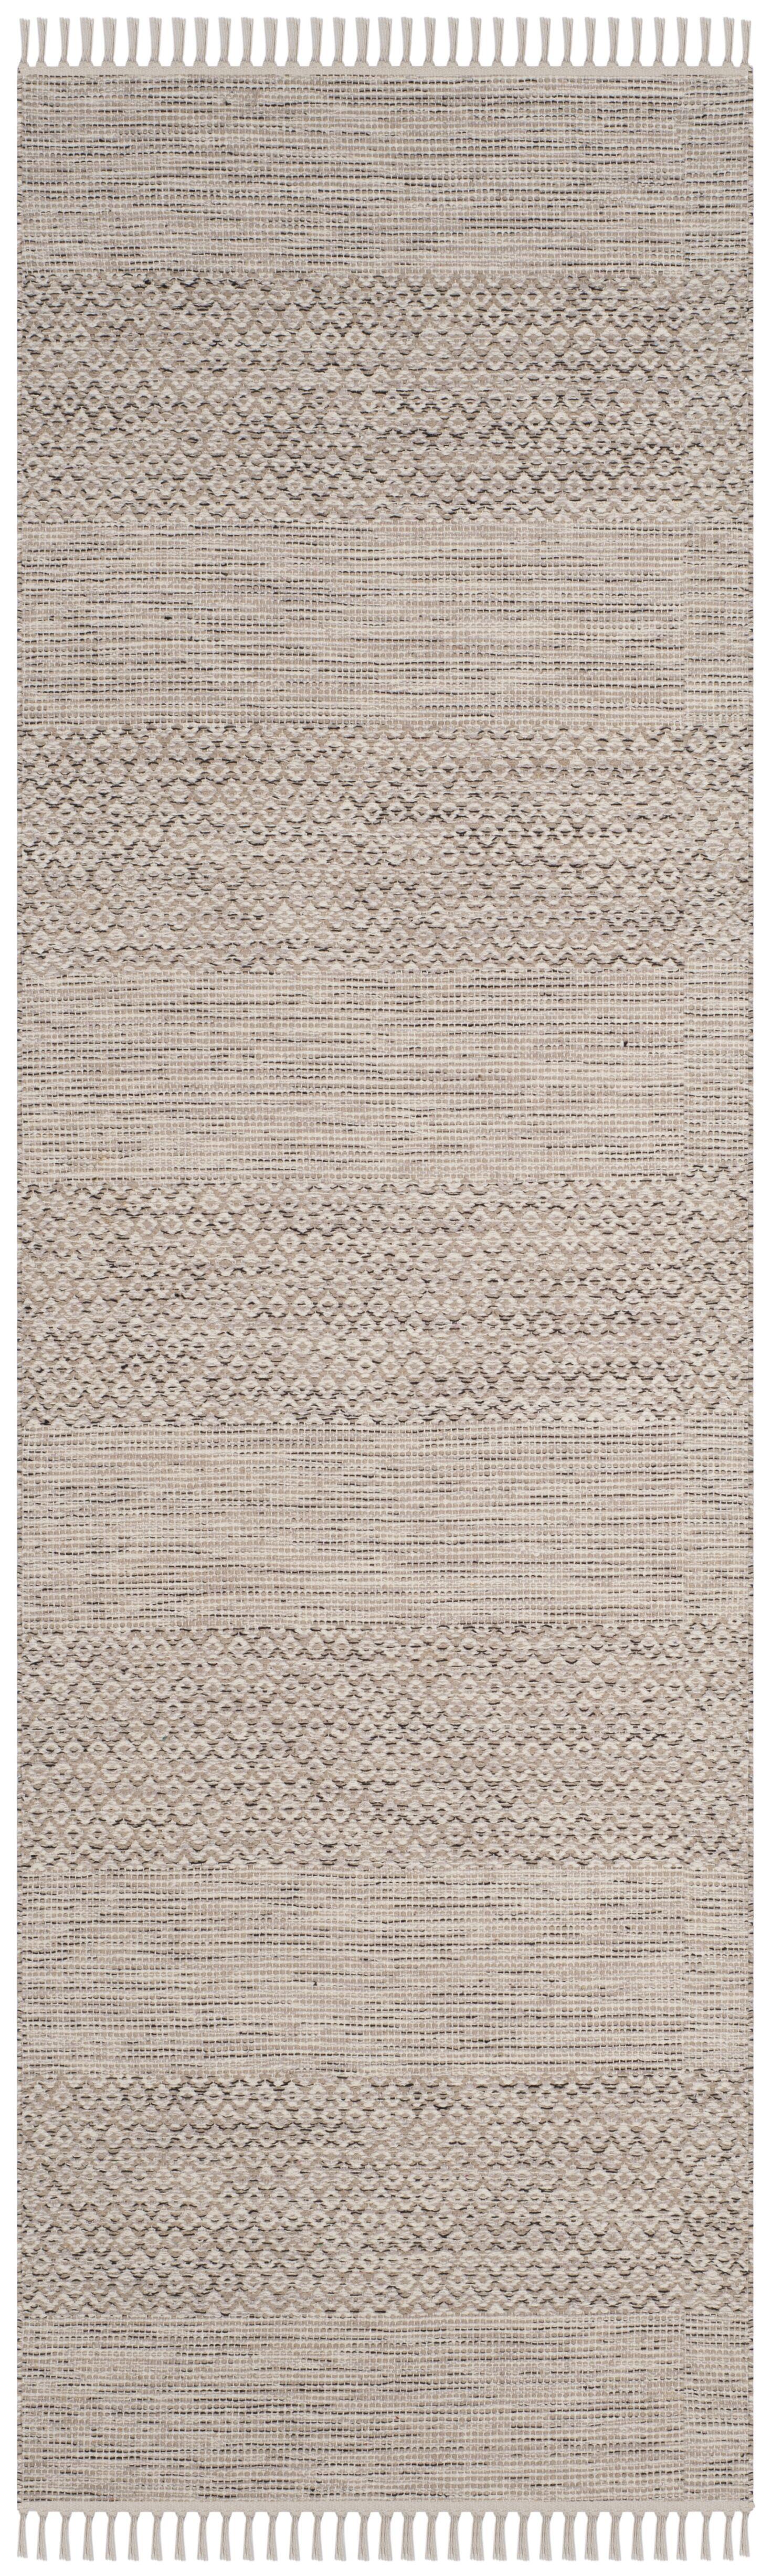 Oxbow Hand-Woven Ivory/Steel Grey Area Rug Rug Size: Runner 2'3